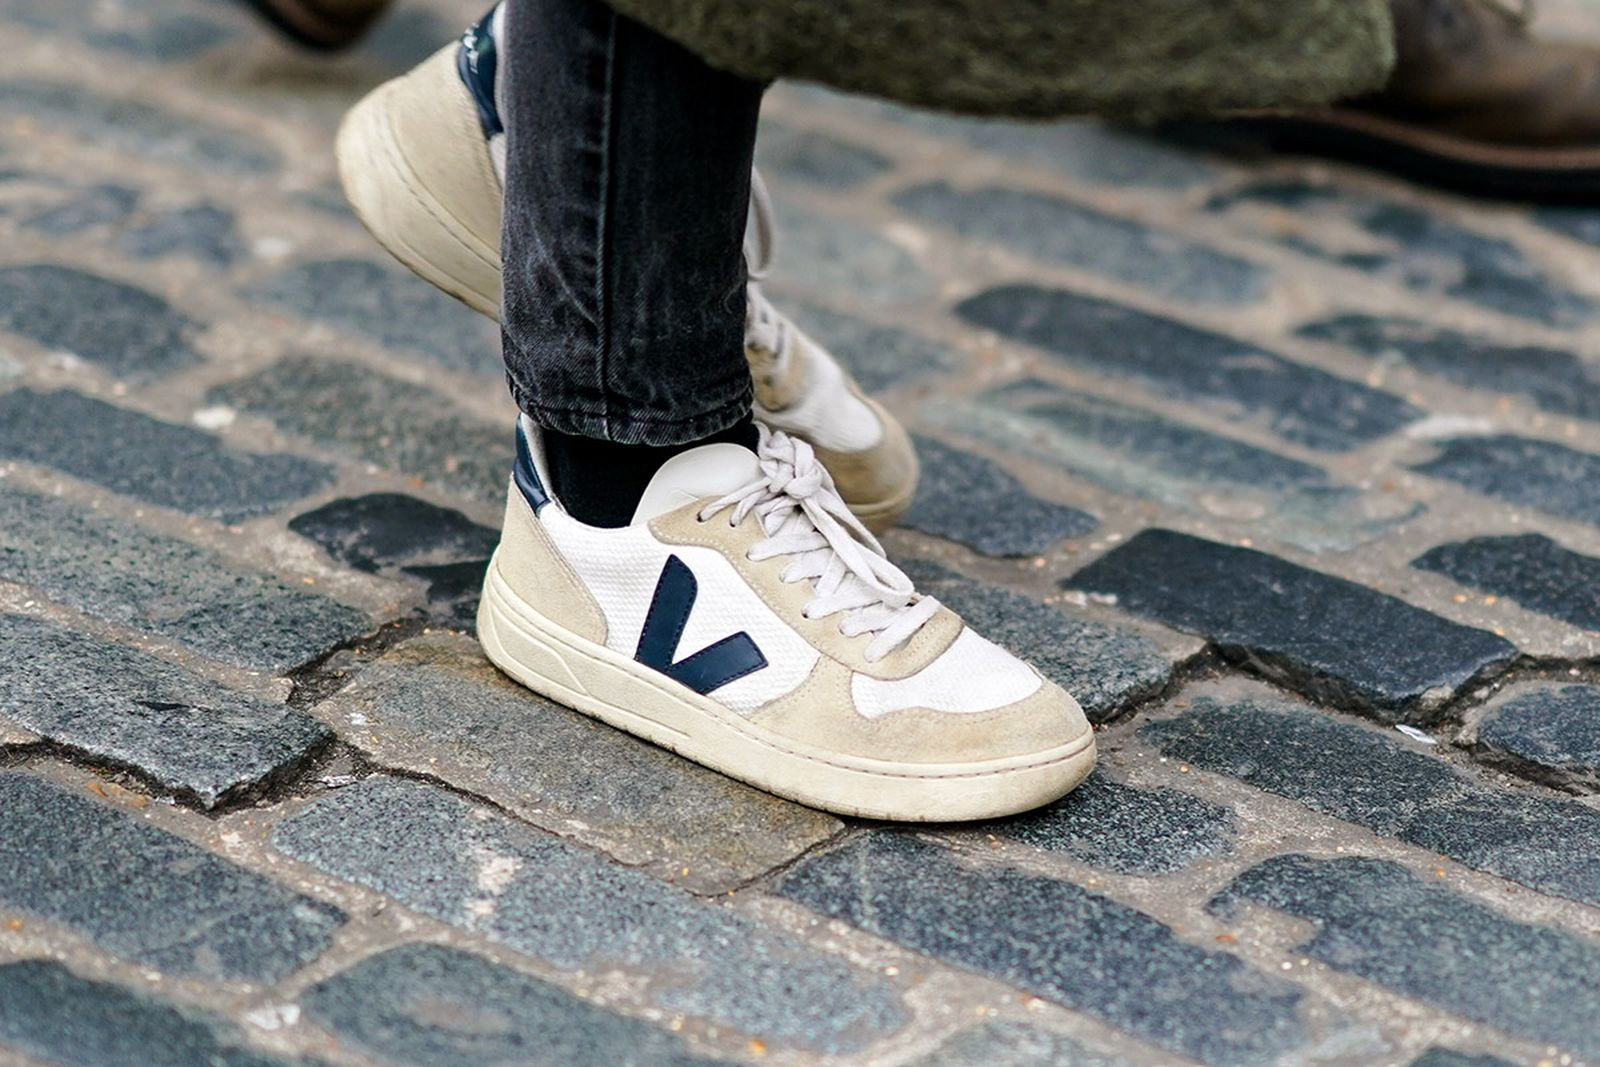 sustainable-sneaker-brands-main